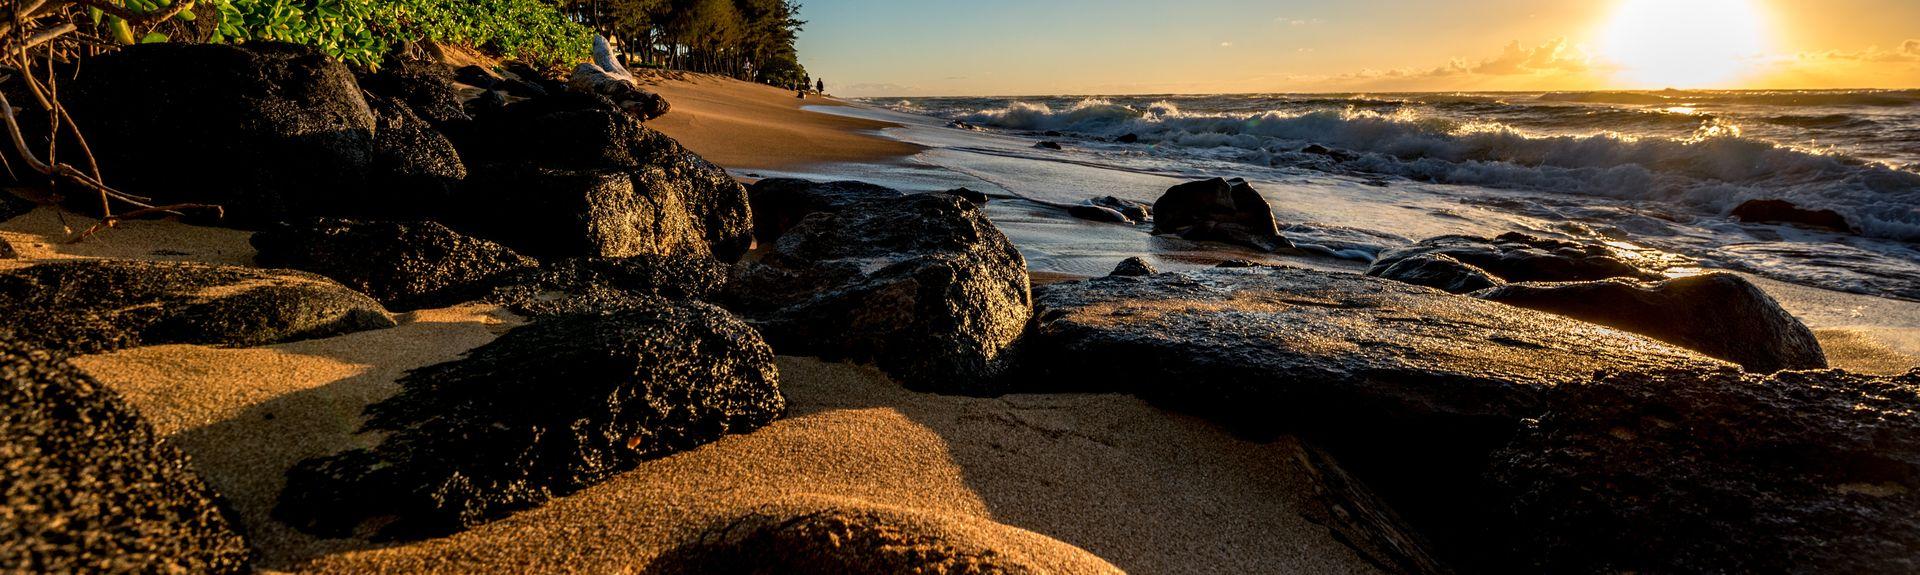 Kauai, Hawaii, United States of America